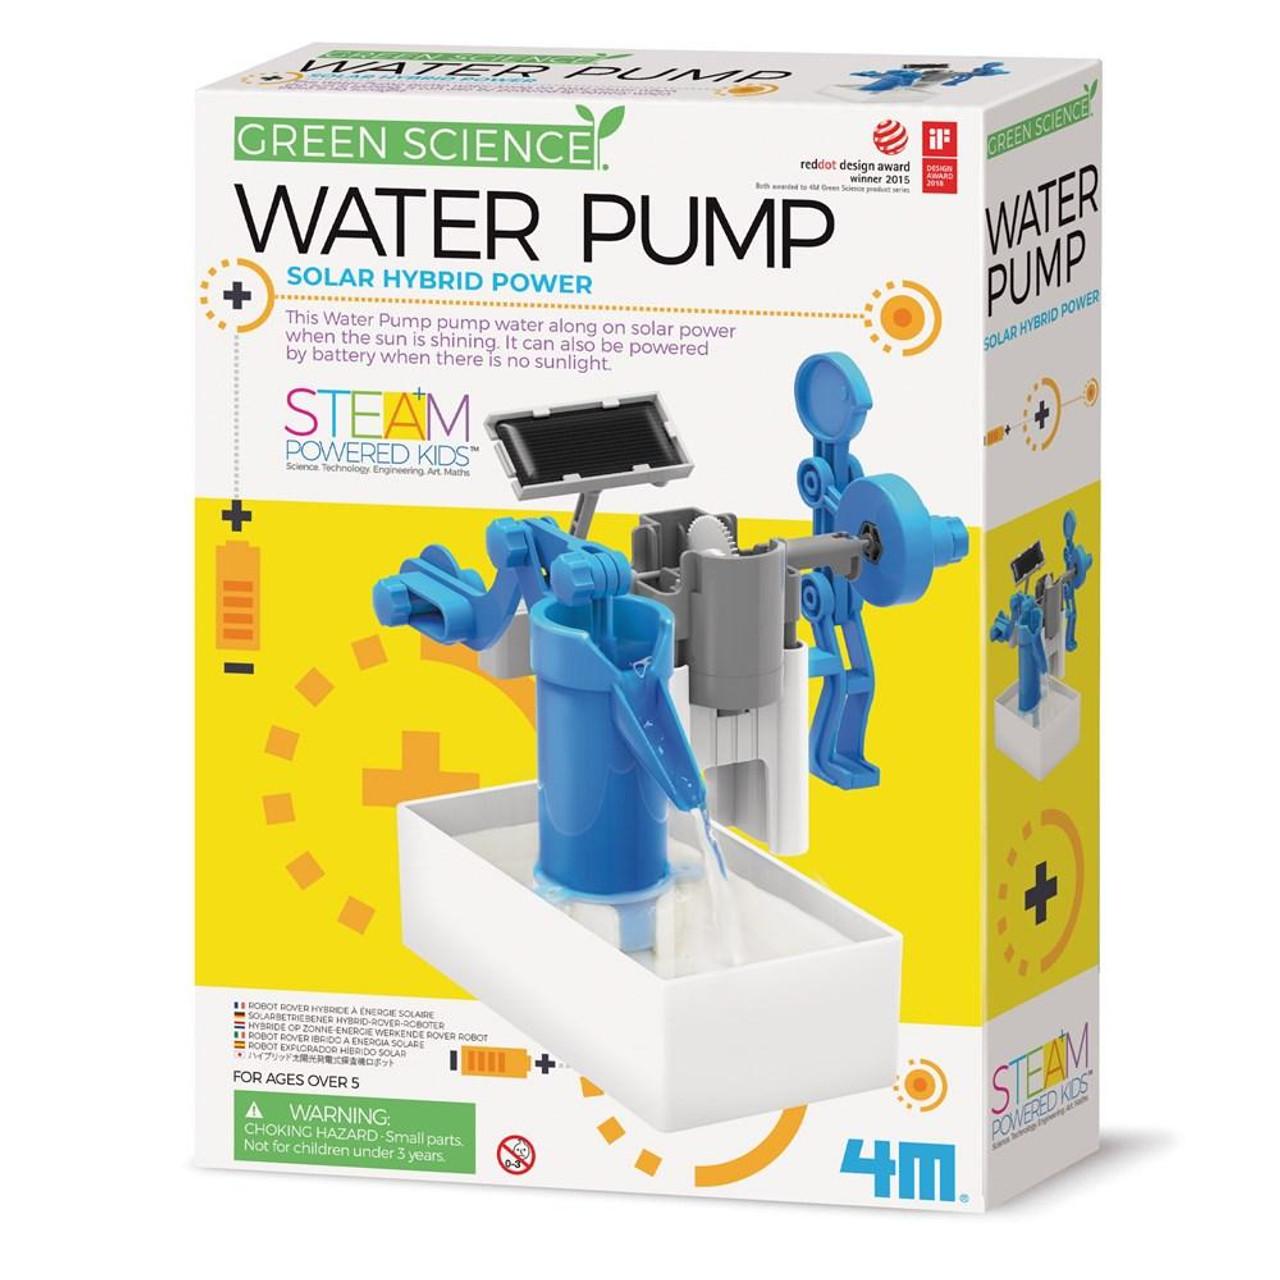 GREEN SCIENCE WATER PUMP